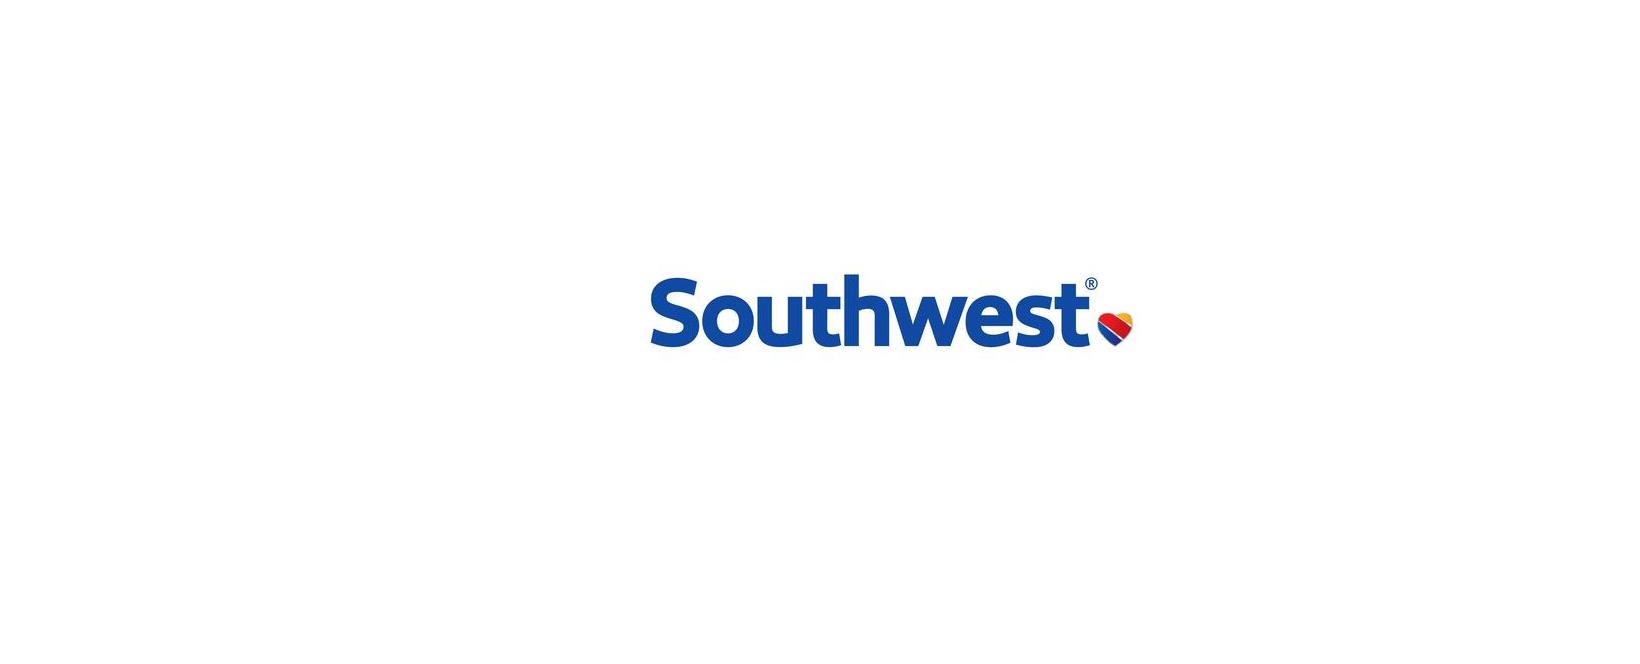 Southwest Discount Code 2021